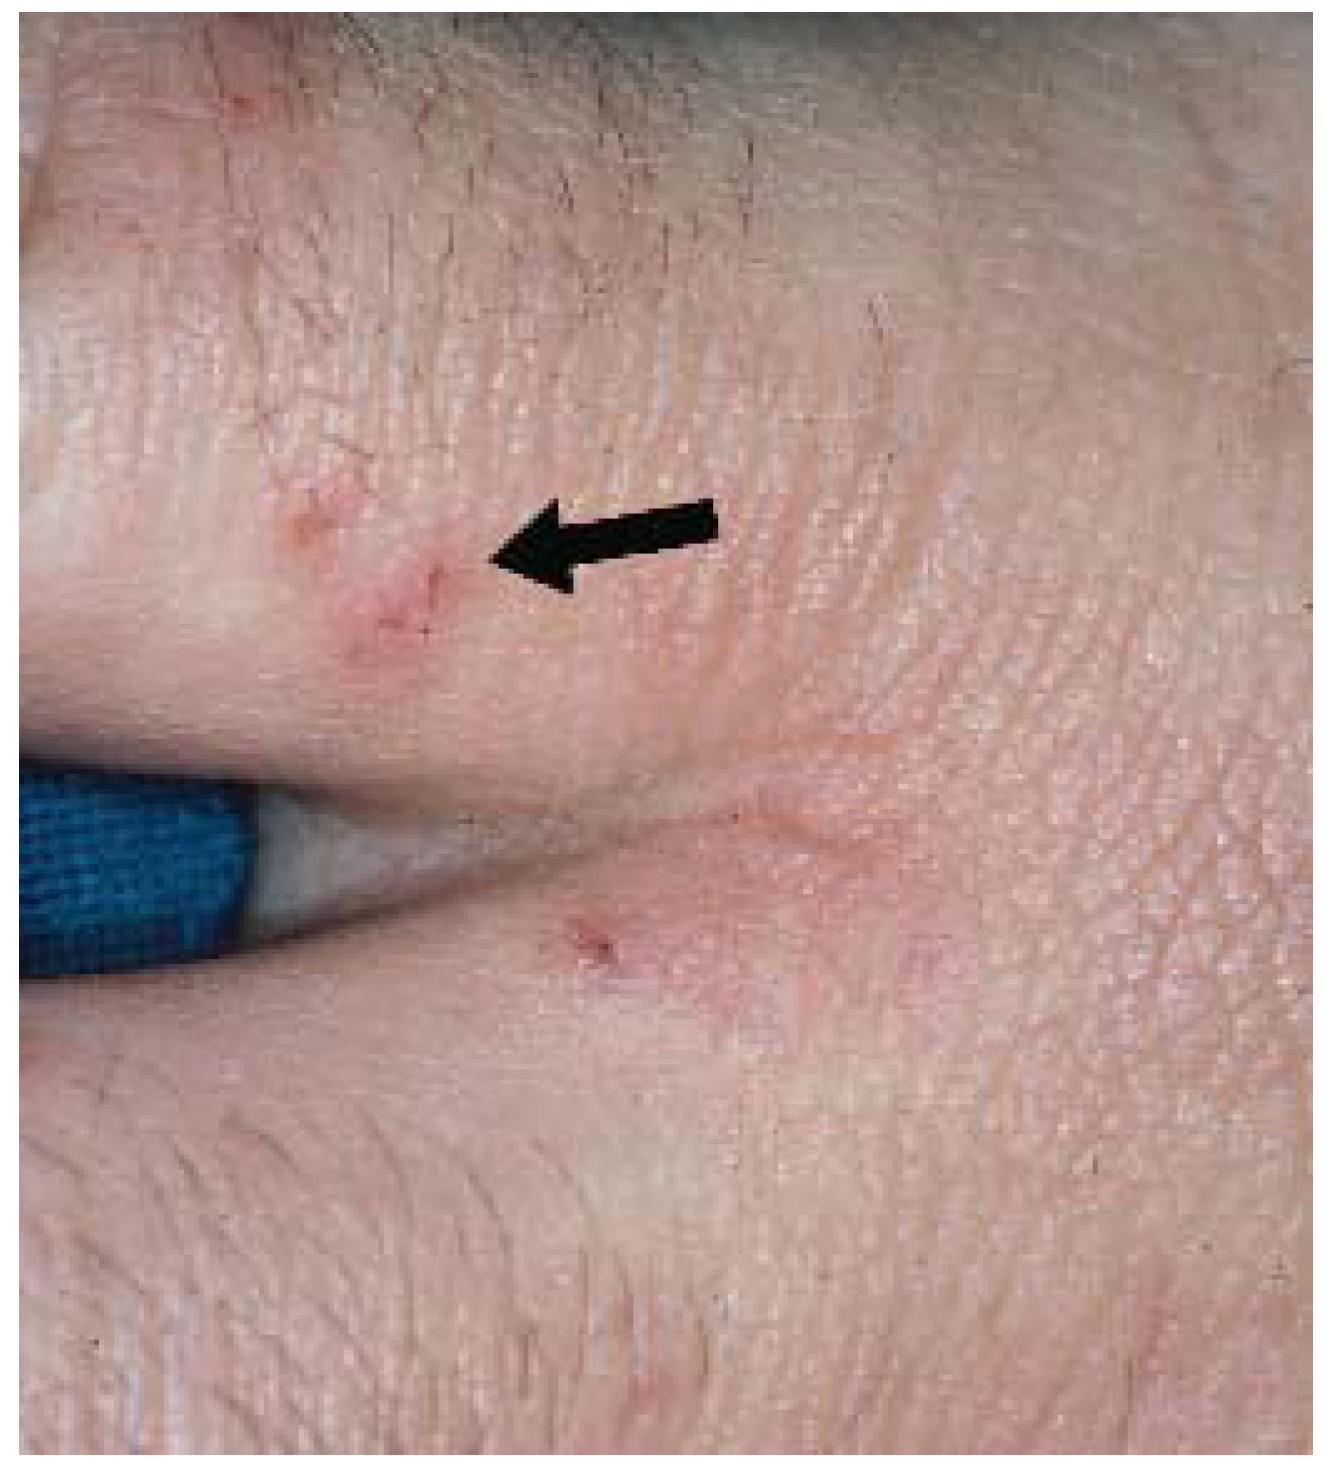 Saint Louis School >> JCM | Free Full-Text | Diagnosis of Atopic Dermatitis ...